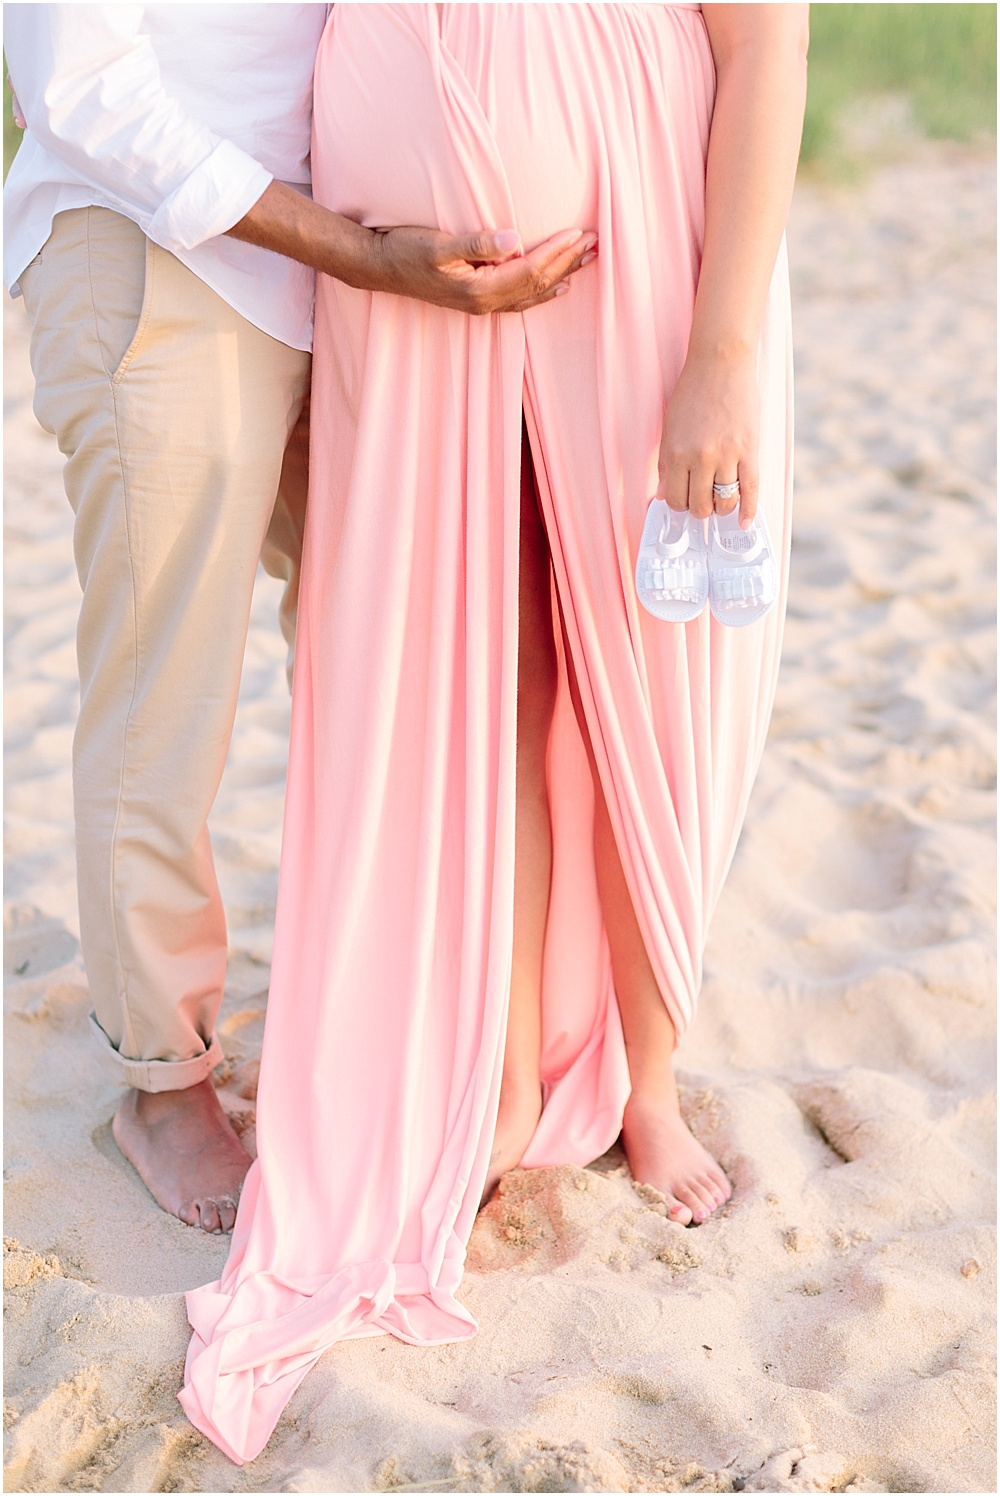 Terrapin_Beach_Stevensville_Maryland_Maternity_Photographer_0019